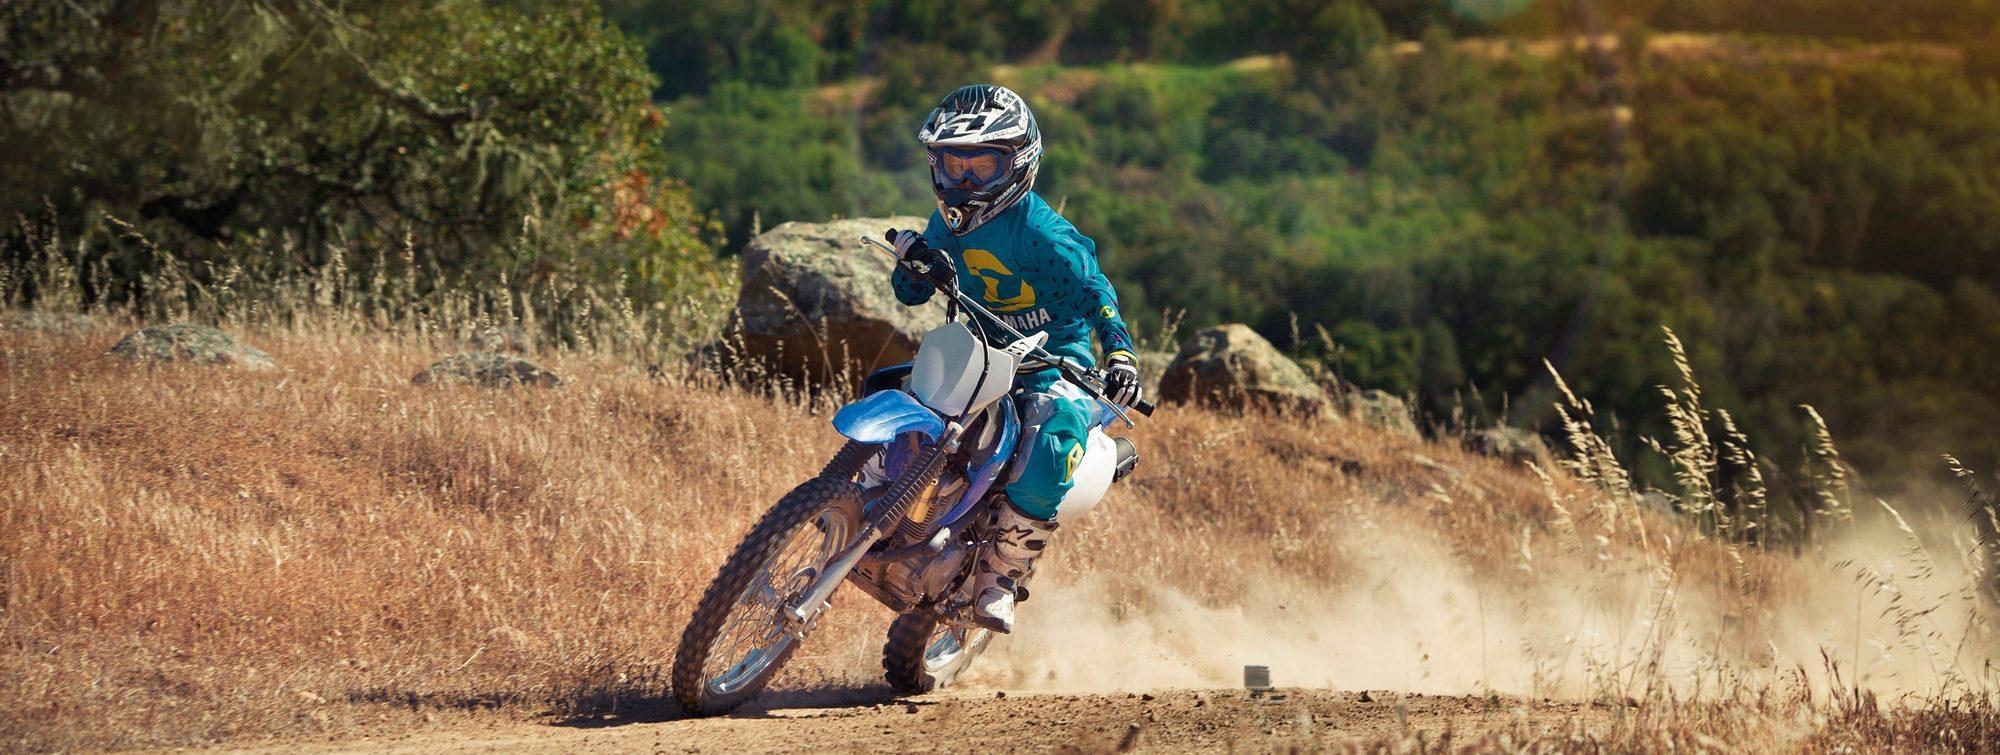 Yamaha TTR 125 Points forts,dispo